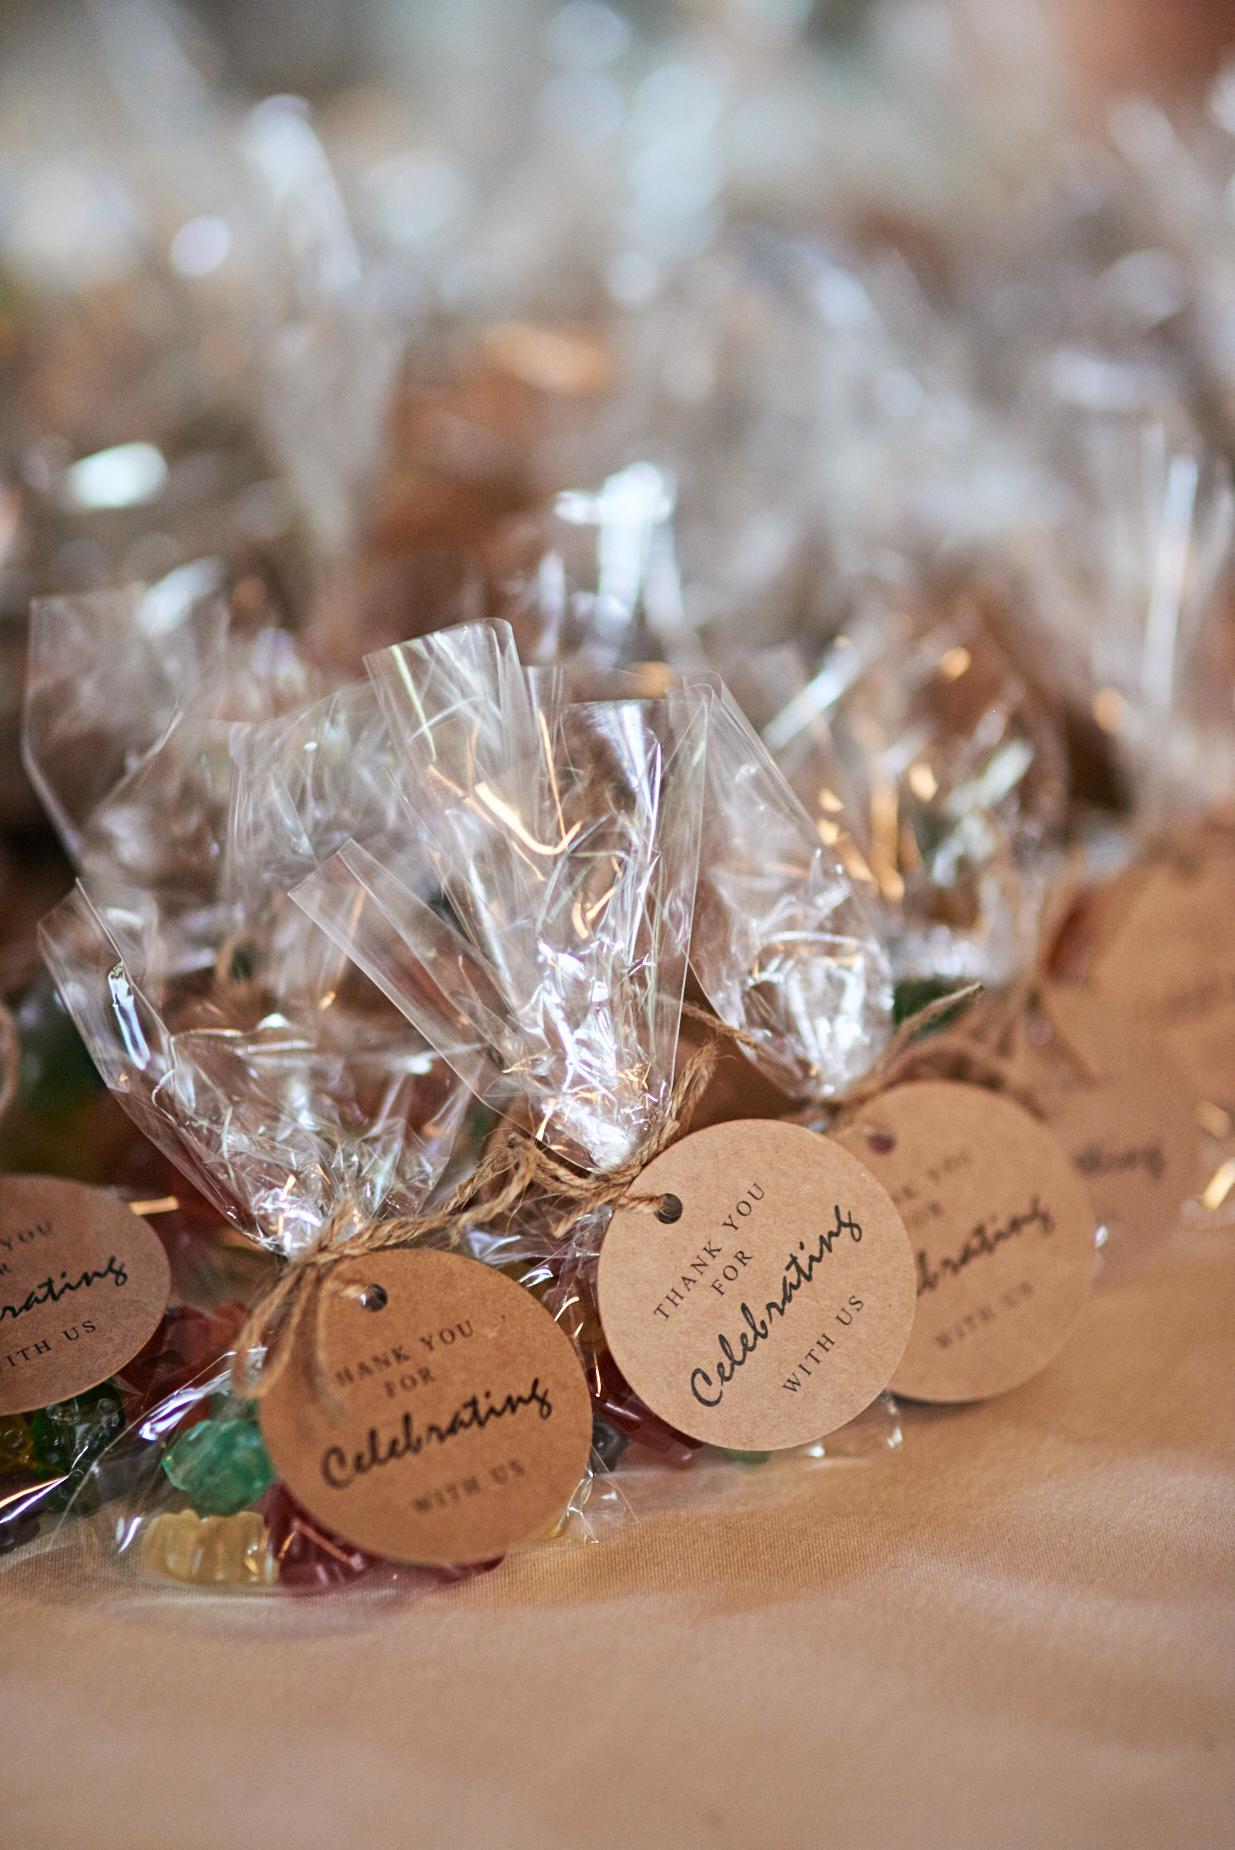 Photography by Cate Bligh - Martha's Vineyard Dream Destination Wedding at Sailing Camp Park in Oak Bluffs, MA